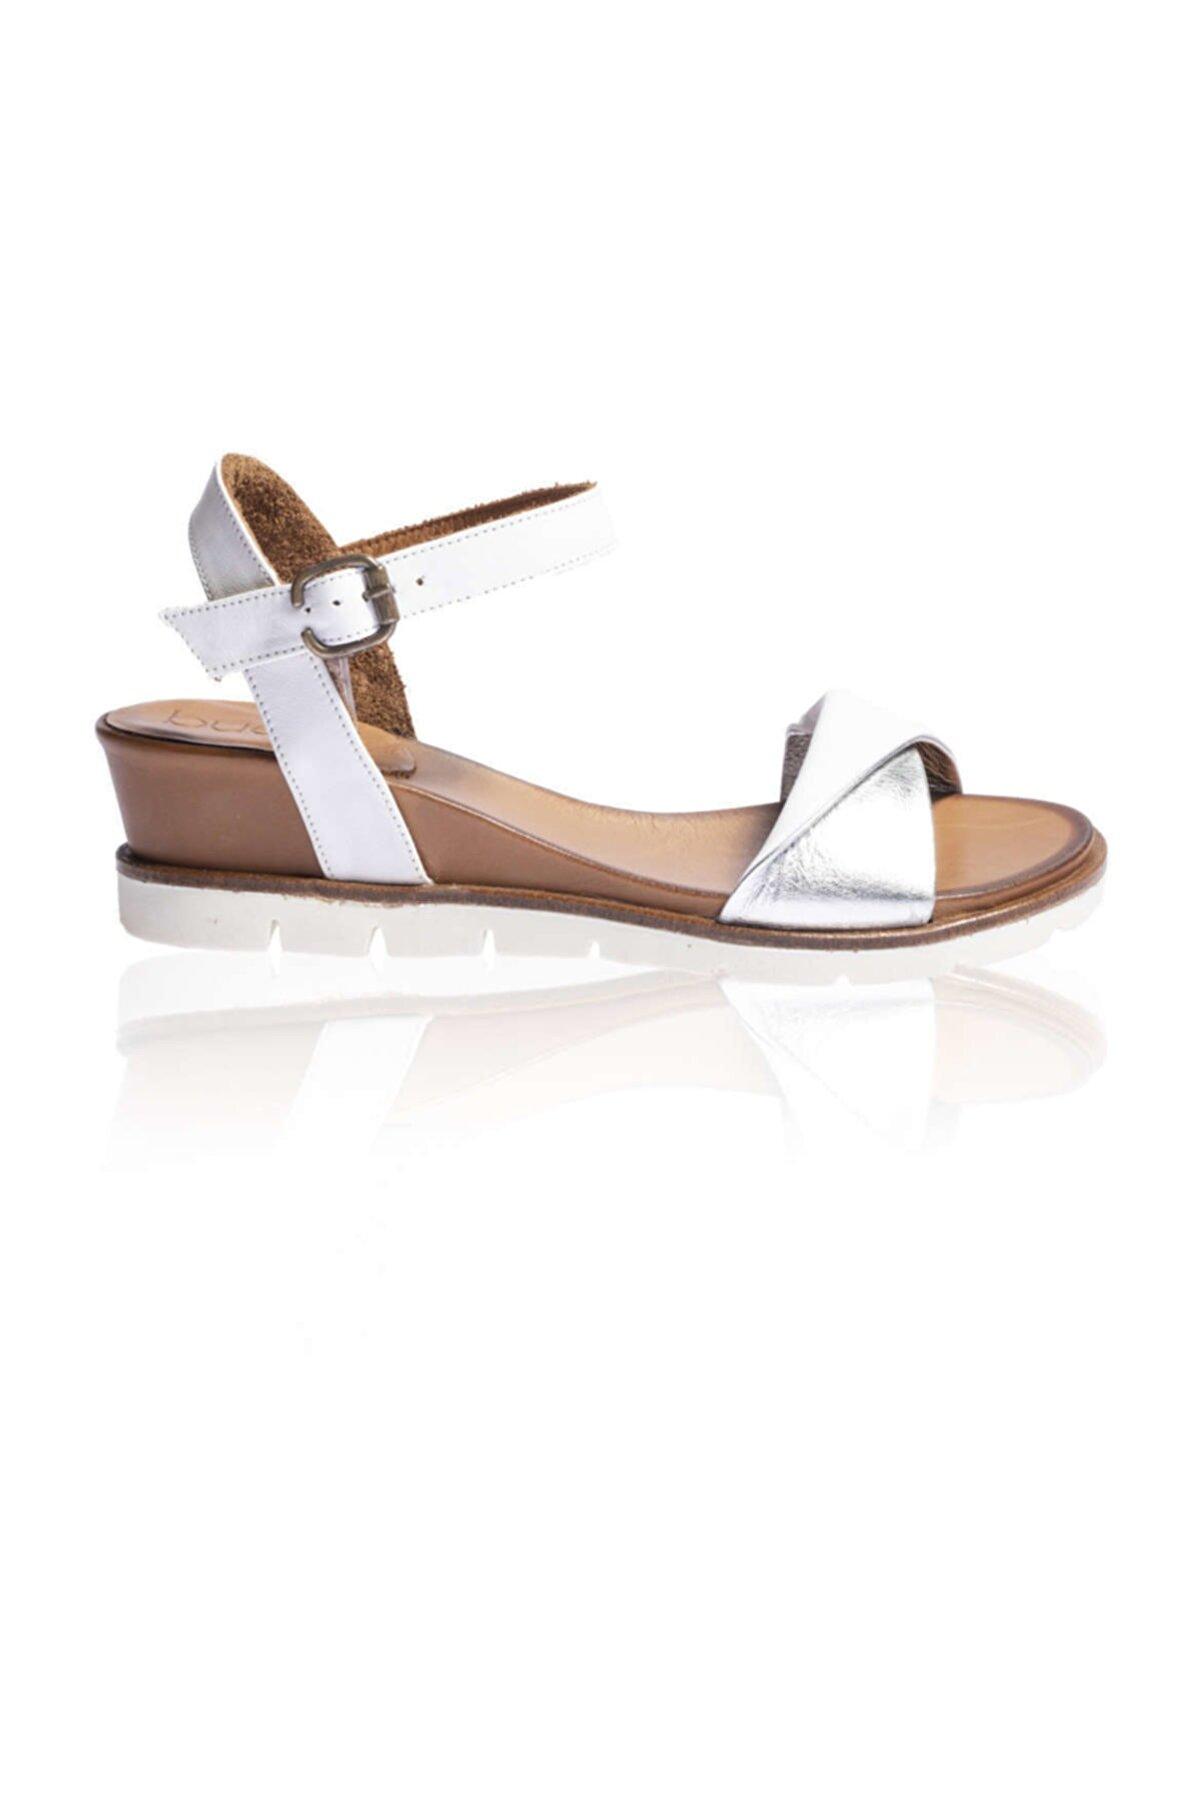 BUENO Shoes Taba Bayan Sandalet 9n2203